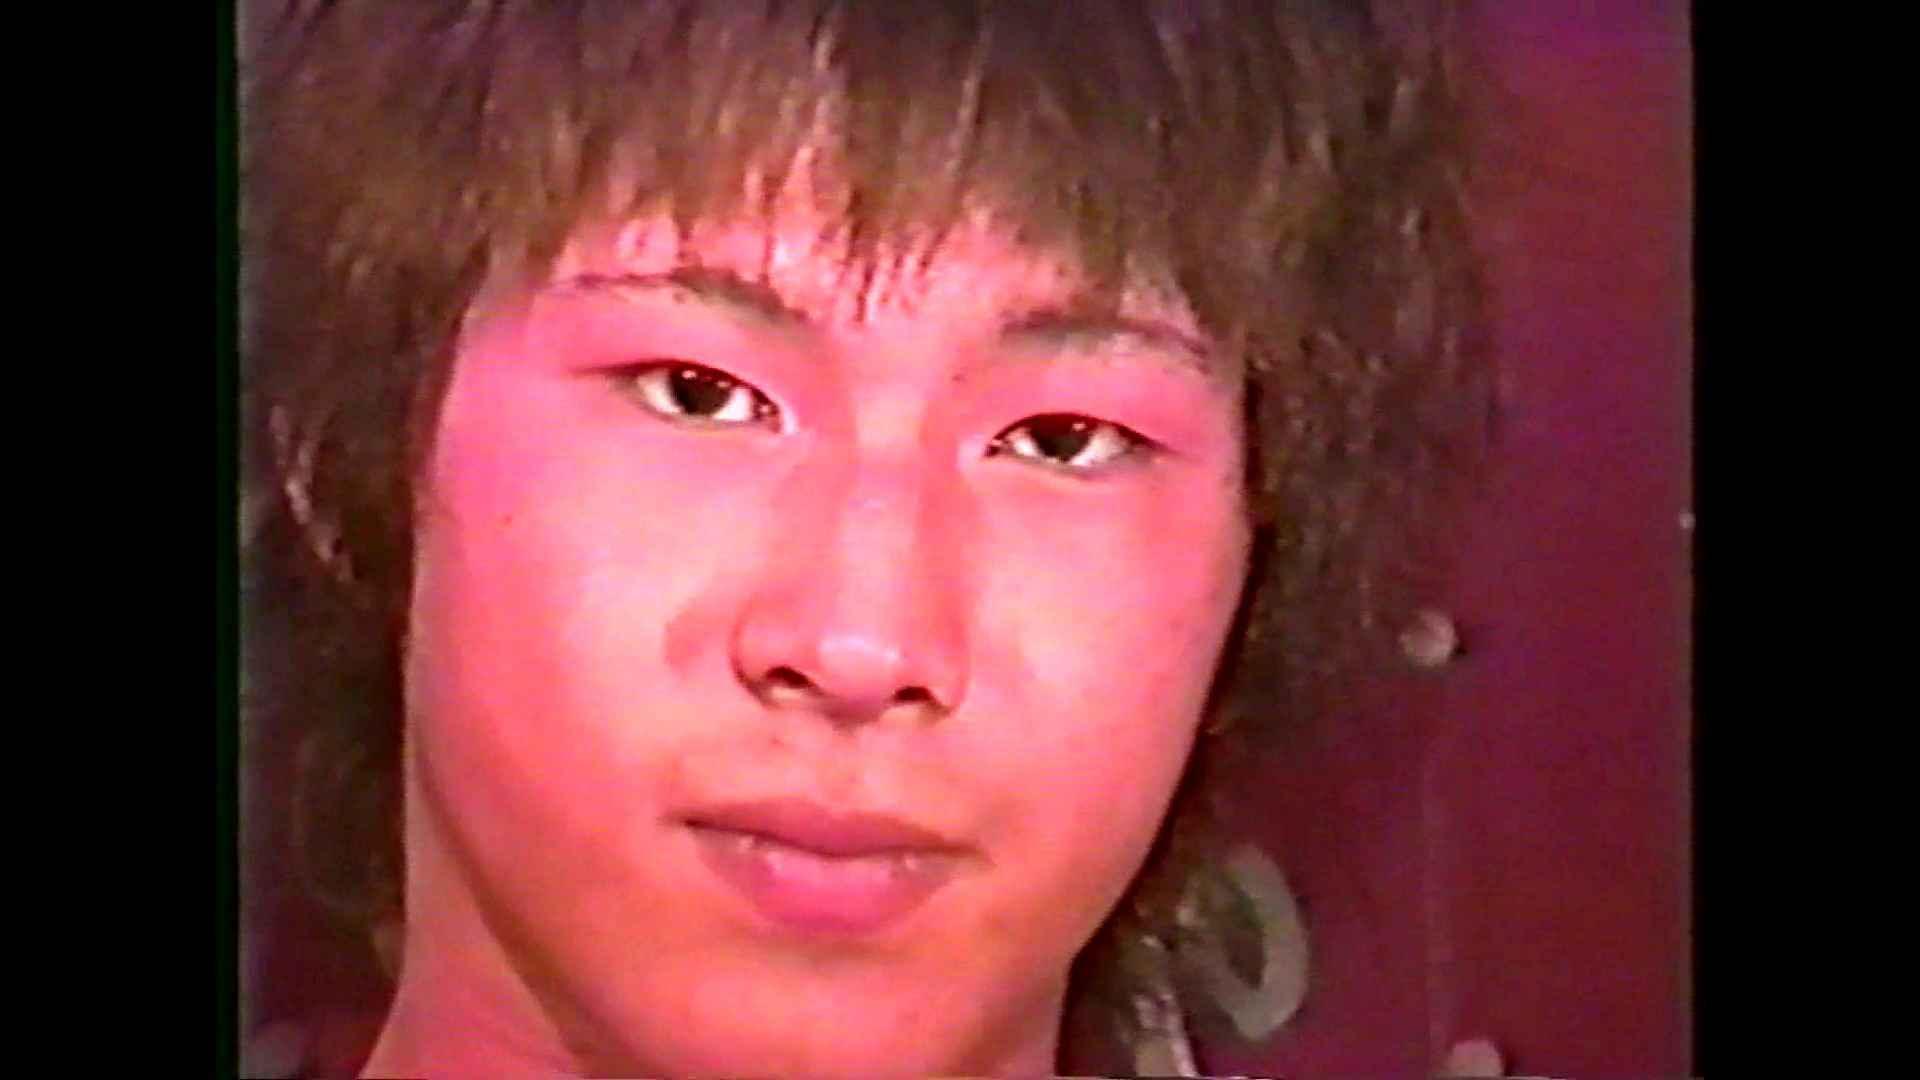 GAYBOY宏のオカズ倉庫Vol.3-4 お風呂 ゲイ丸見え画像 91pic 77